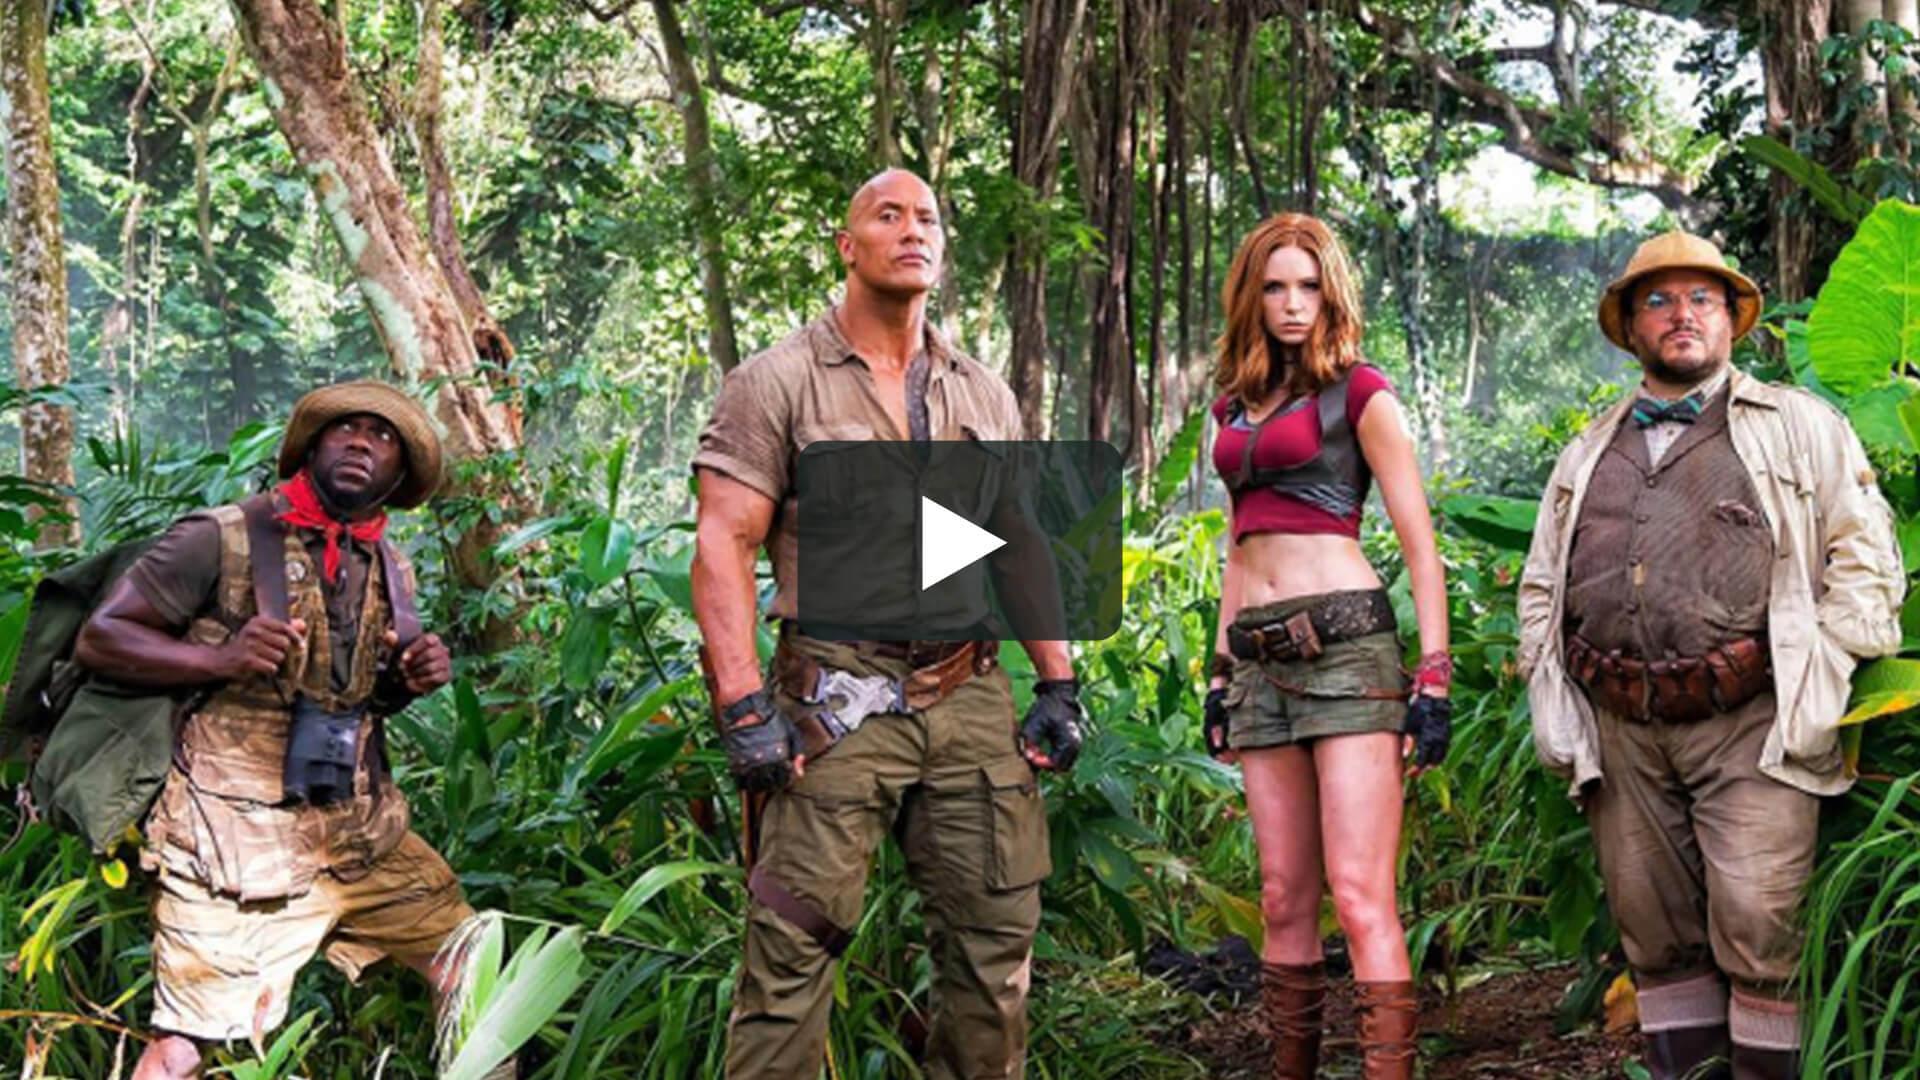 Jumanji 2: Welcome to the Jungle - 勇敢者的遊戲2:決戰叢林